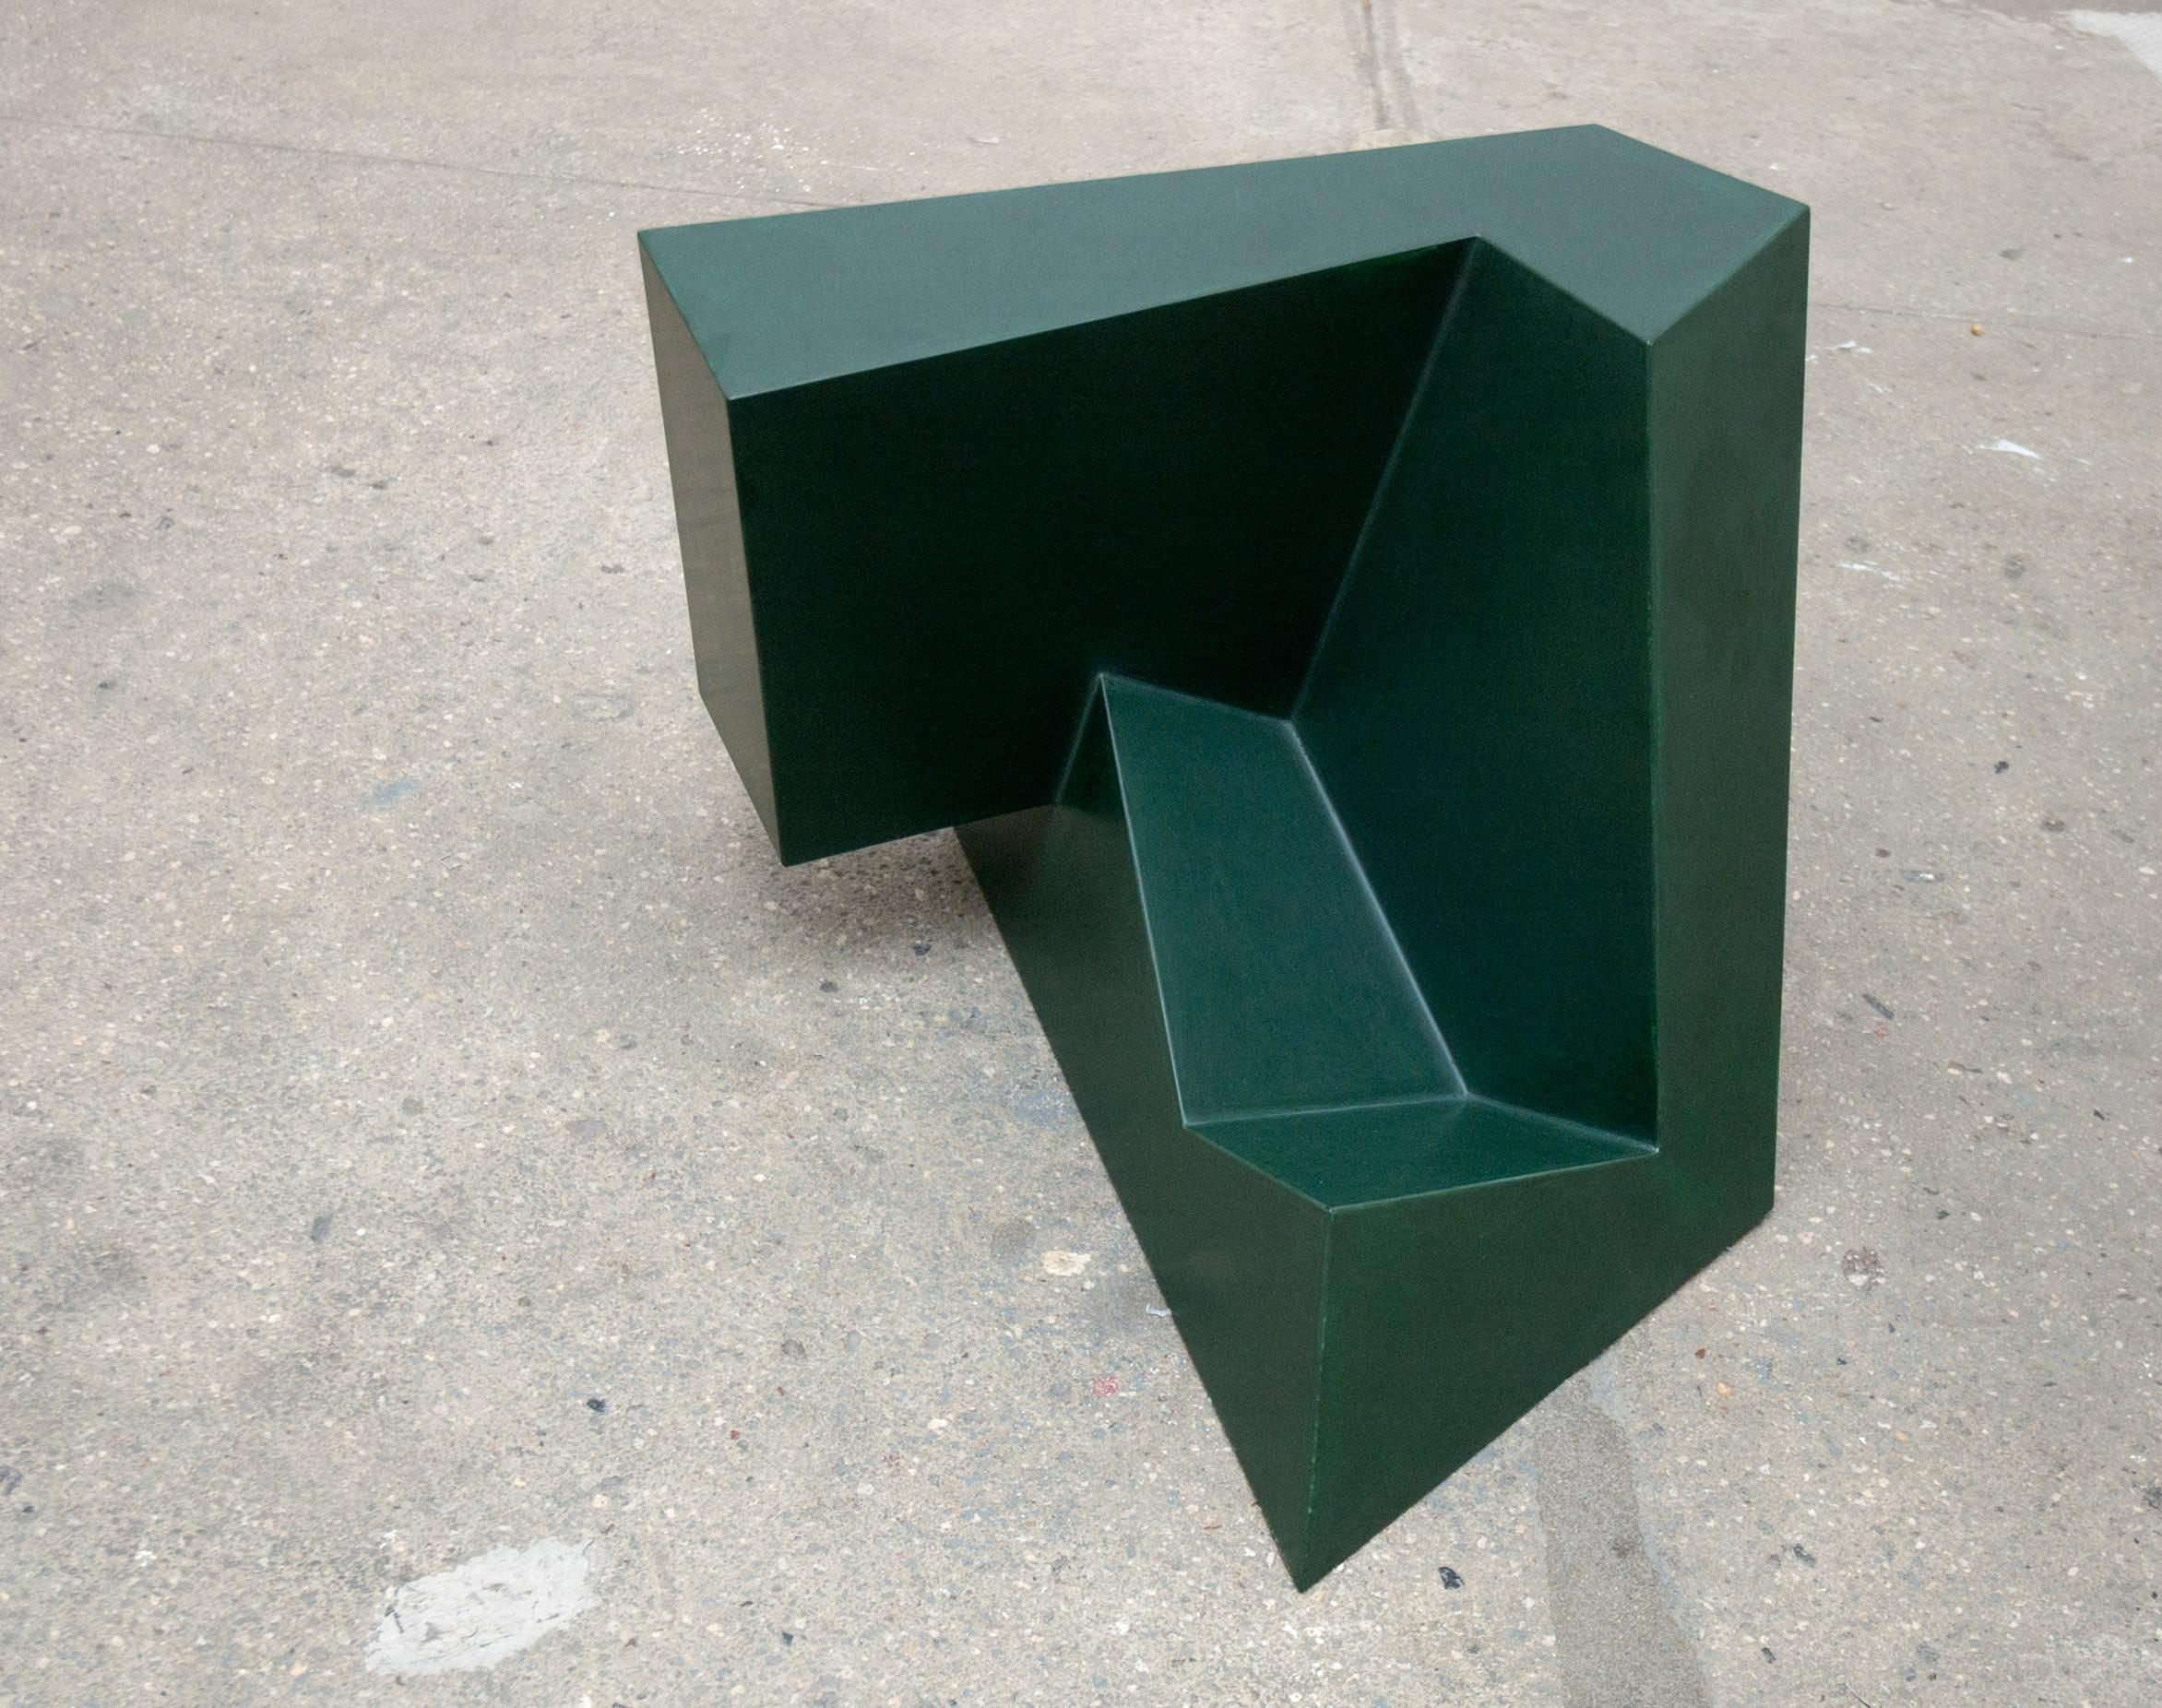 Garth Evans Under Foot, 1987 Epoxy resin, fiberglass, paint